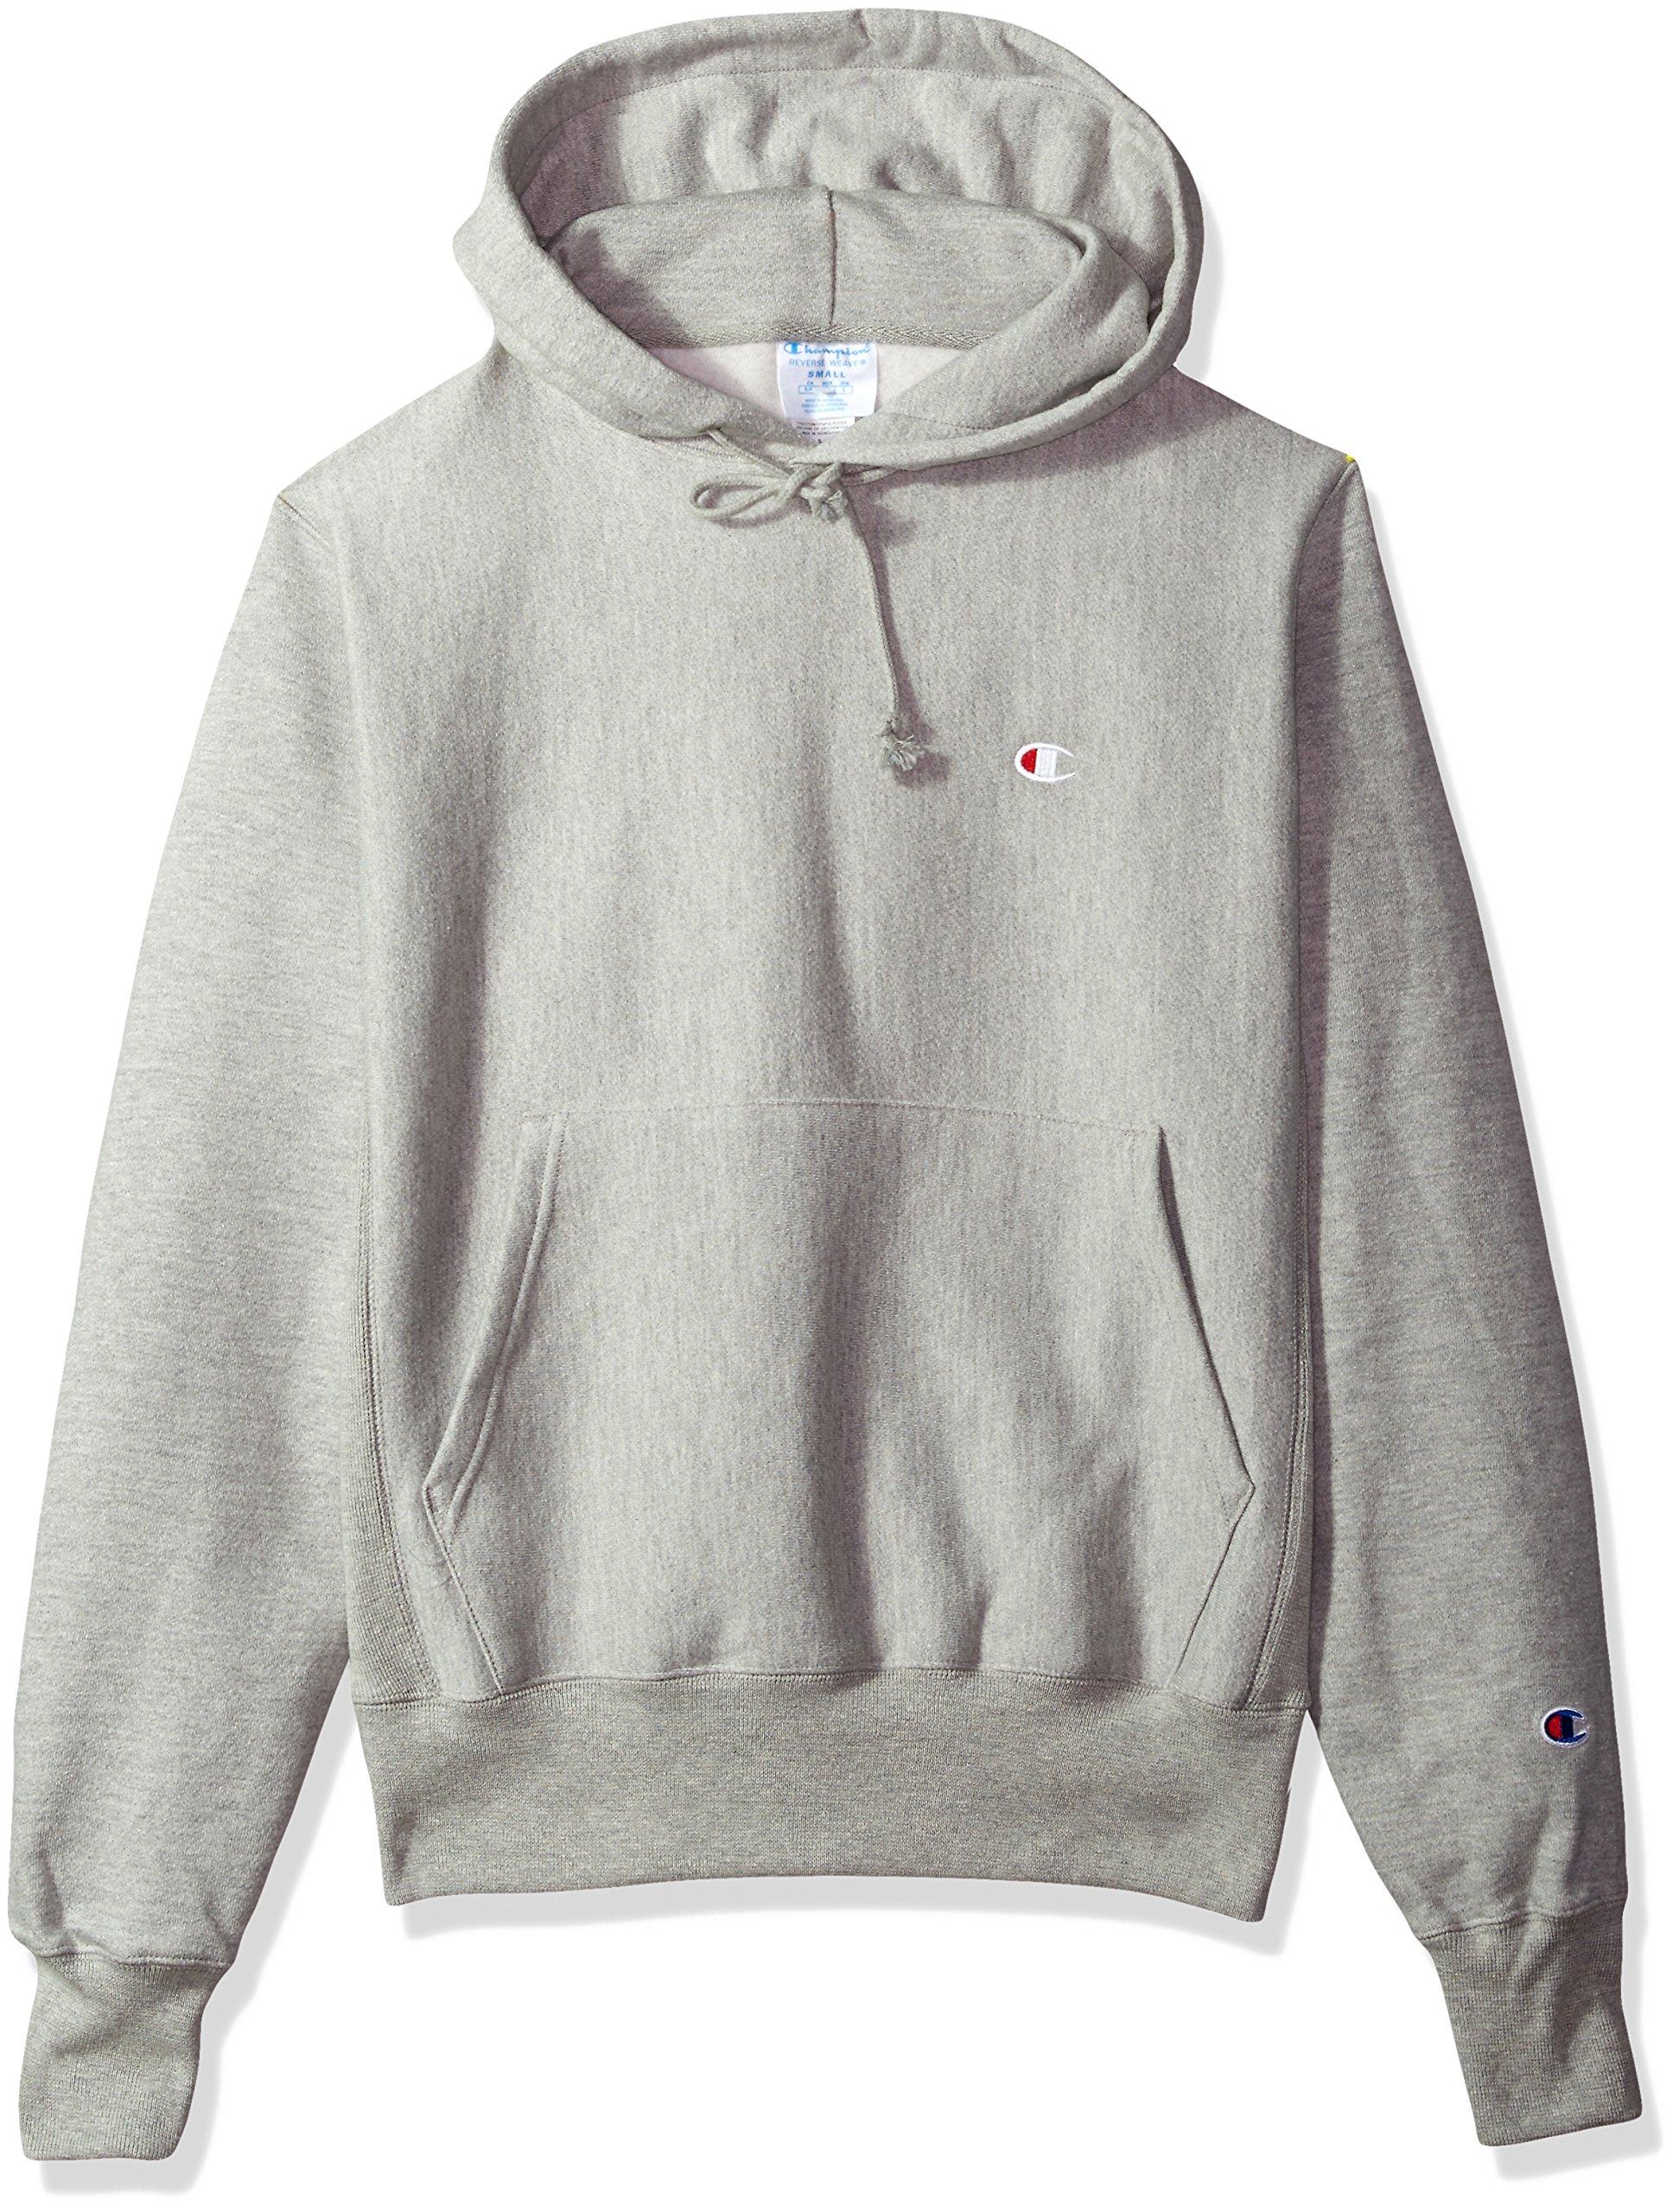 724cfc05 Galleon - Champion LIFE Men's Reverse Weave Pullover Hoodie, Oxford Gray/Left  Chest C Logo, Medium